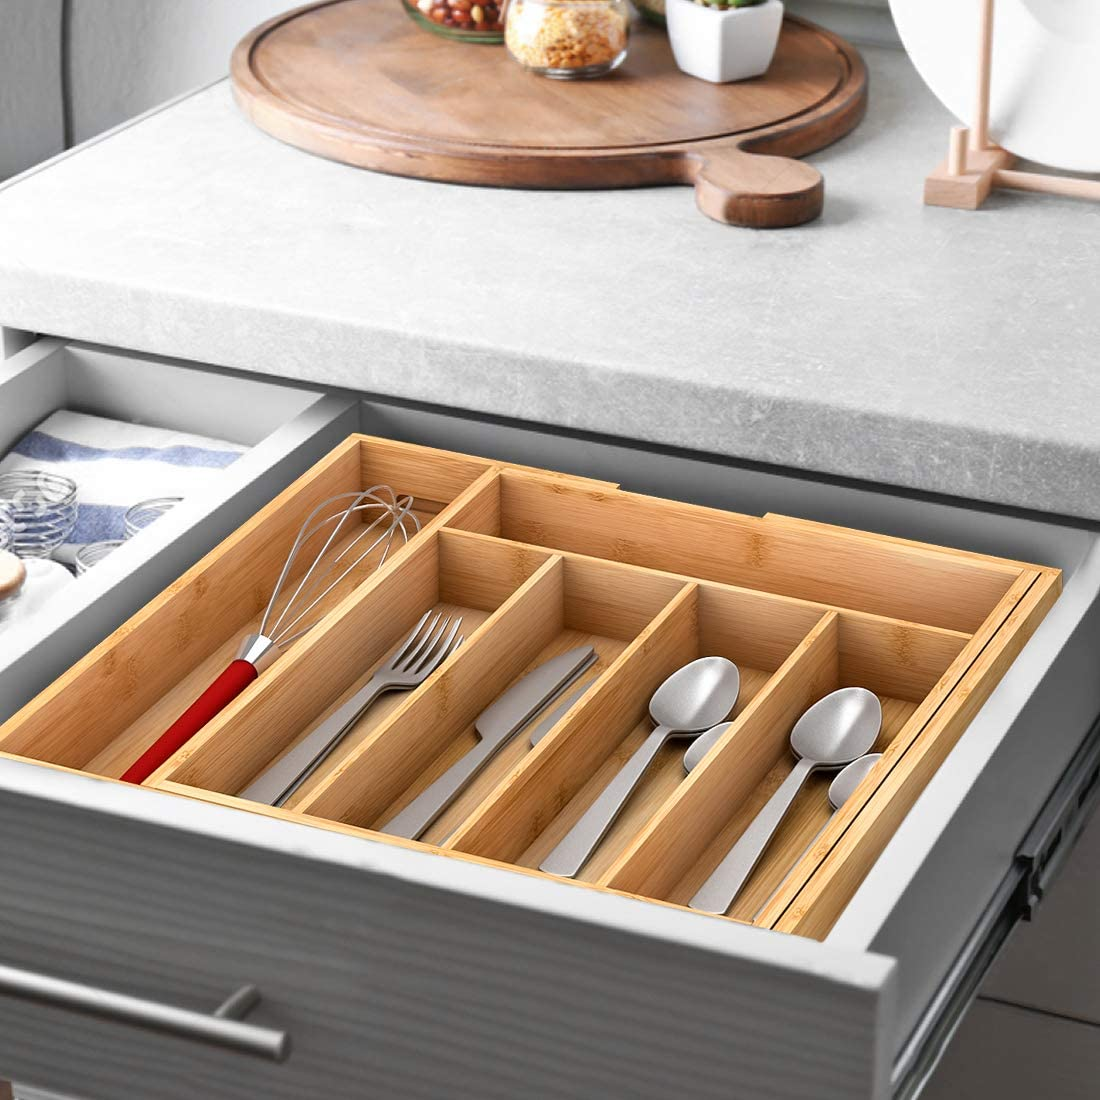 FWKTG Bamb/ú Cubiertos Organizador Cajon de Cubertero Bandeja Extensible Ordenar Utensilios Bandeja para Cubiertos y Multiusos para Organizar Cajones de Cocina